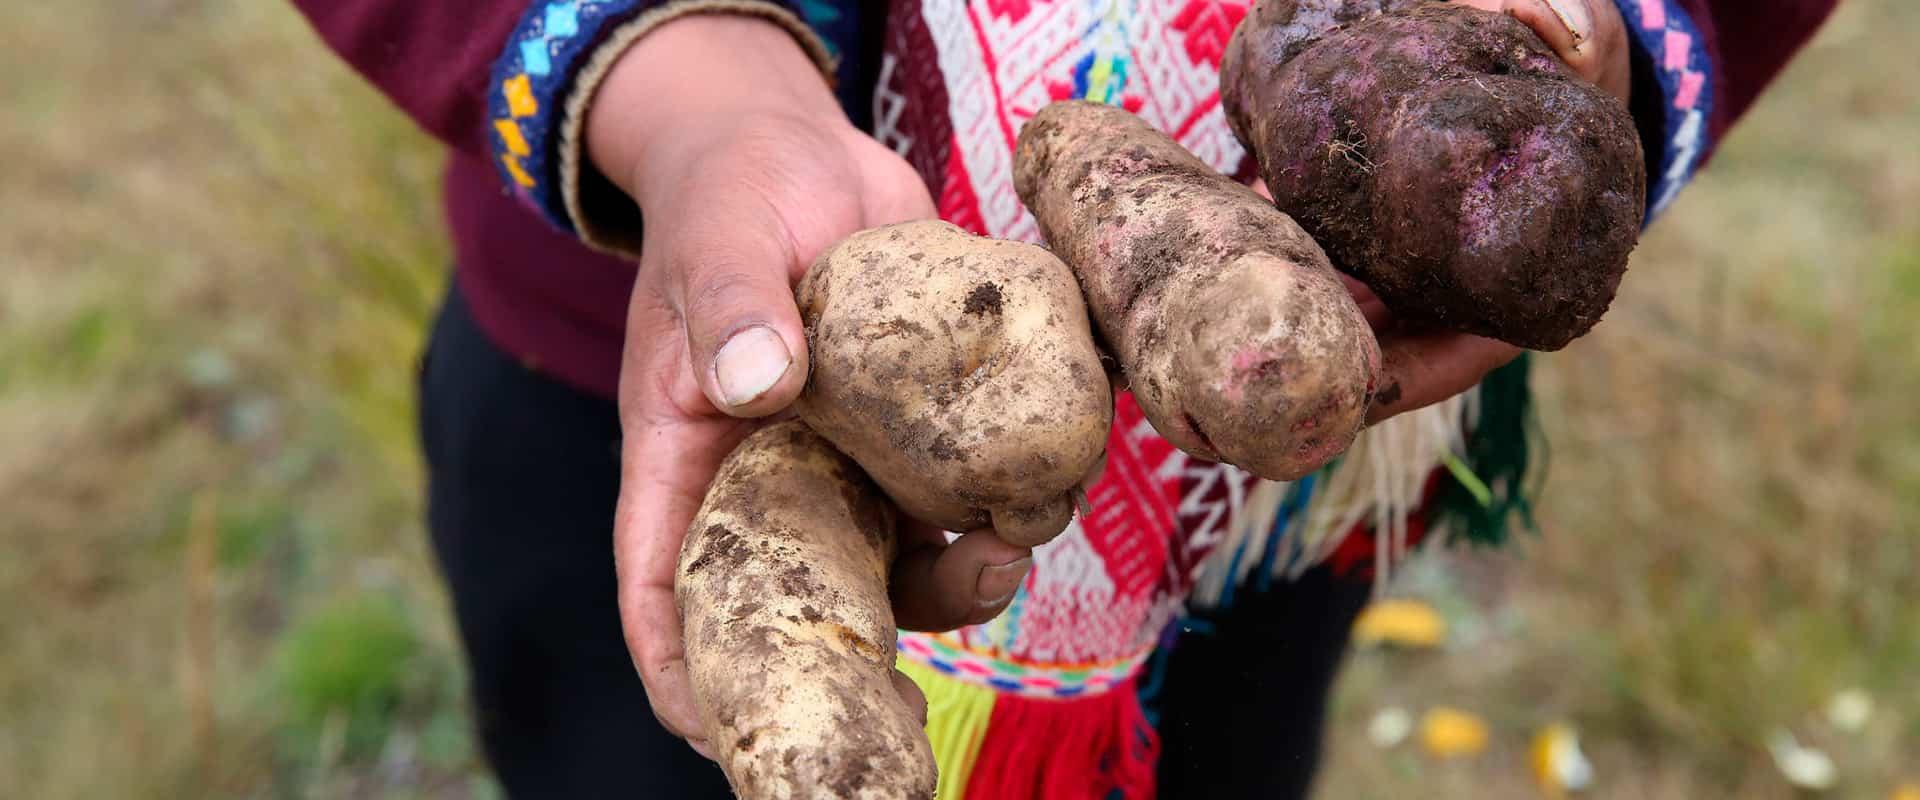 Tours: Potato Park, Experiential Tour in Cusco 1 Day